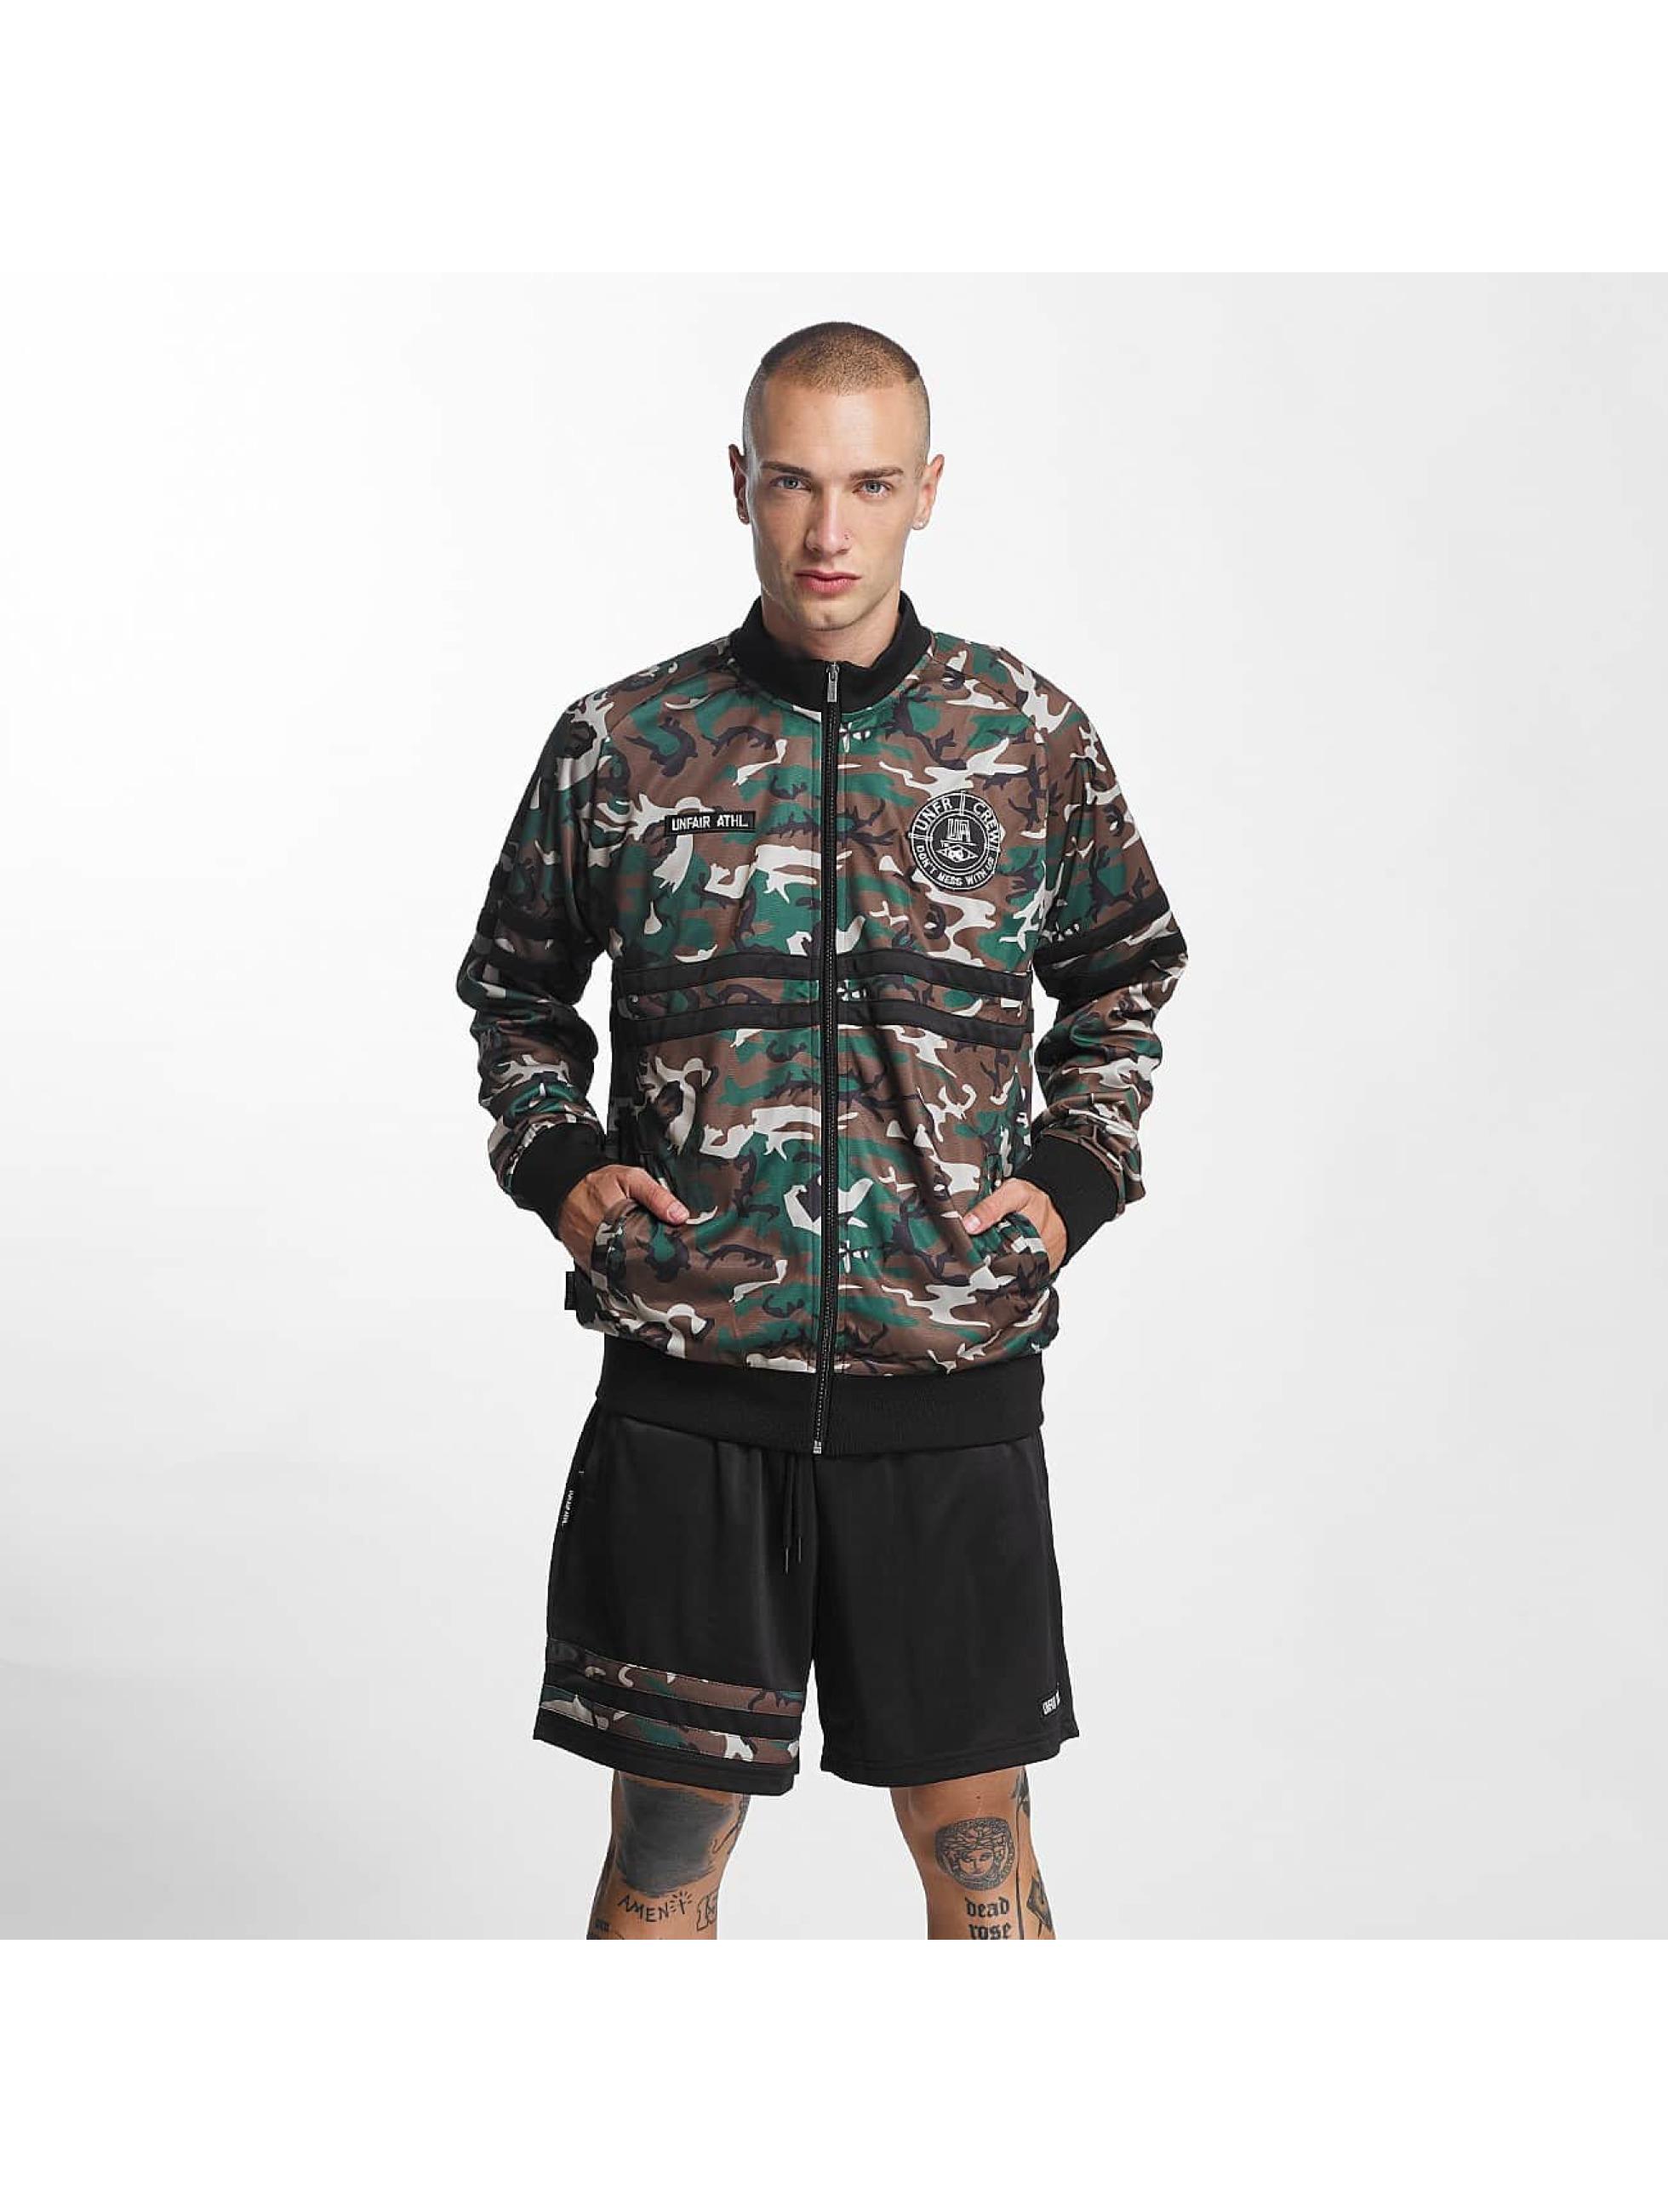 UNFAIR ATHLETICS Männer Übergangsjacke DMWU Tracktop in camouflage